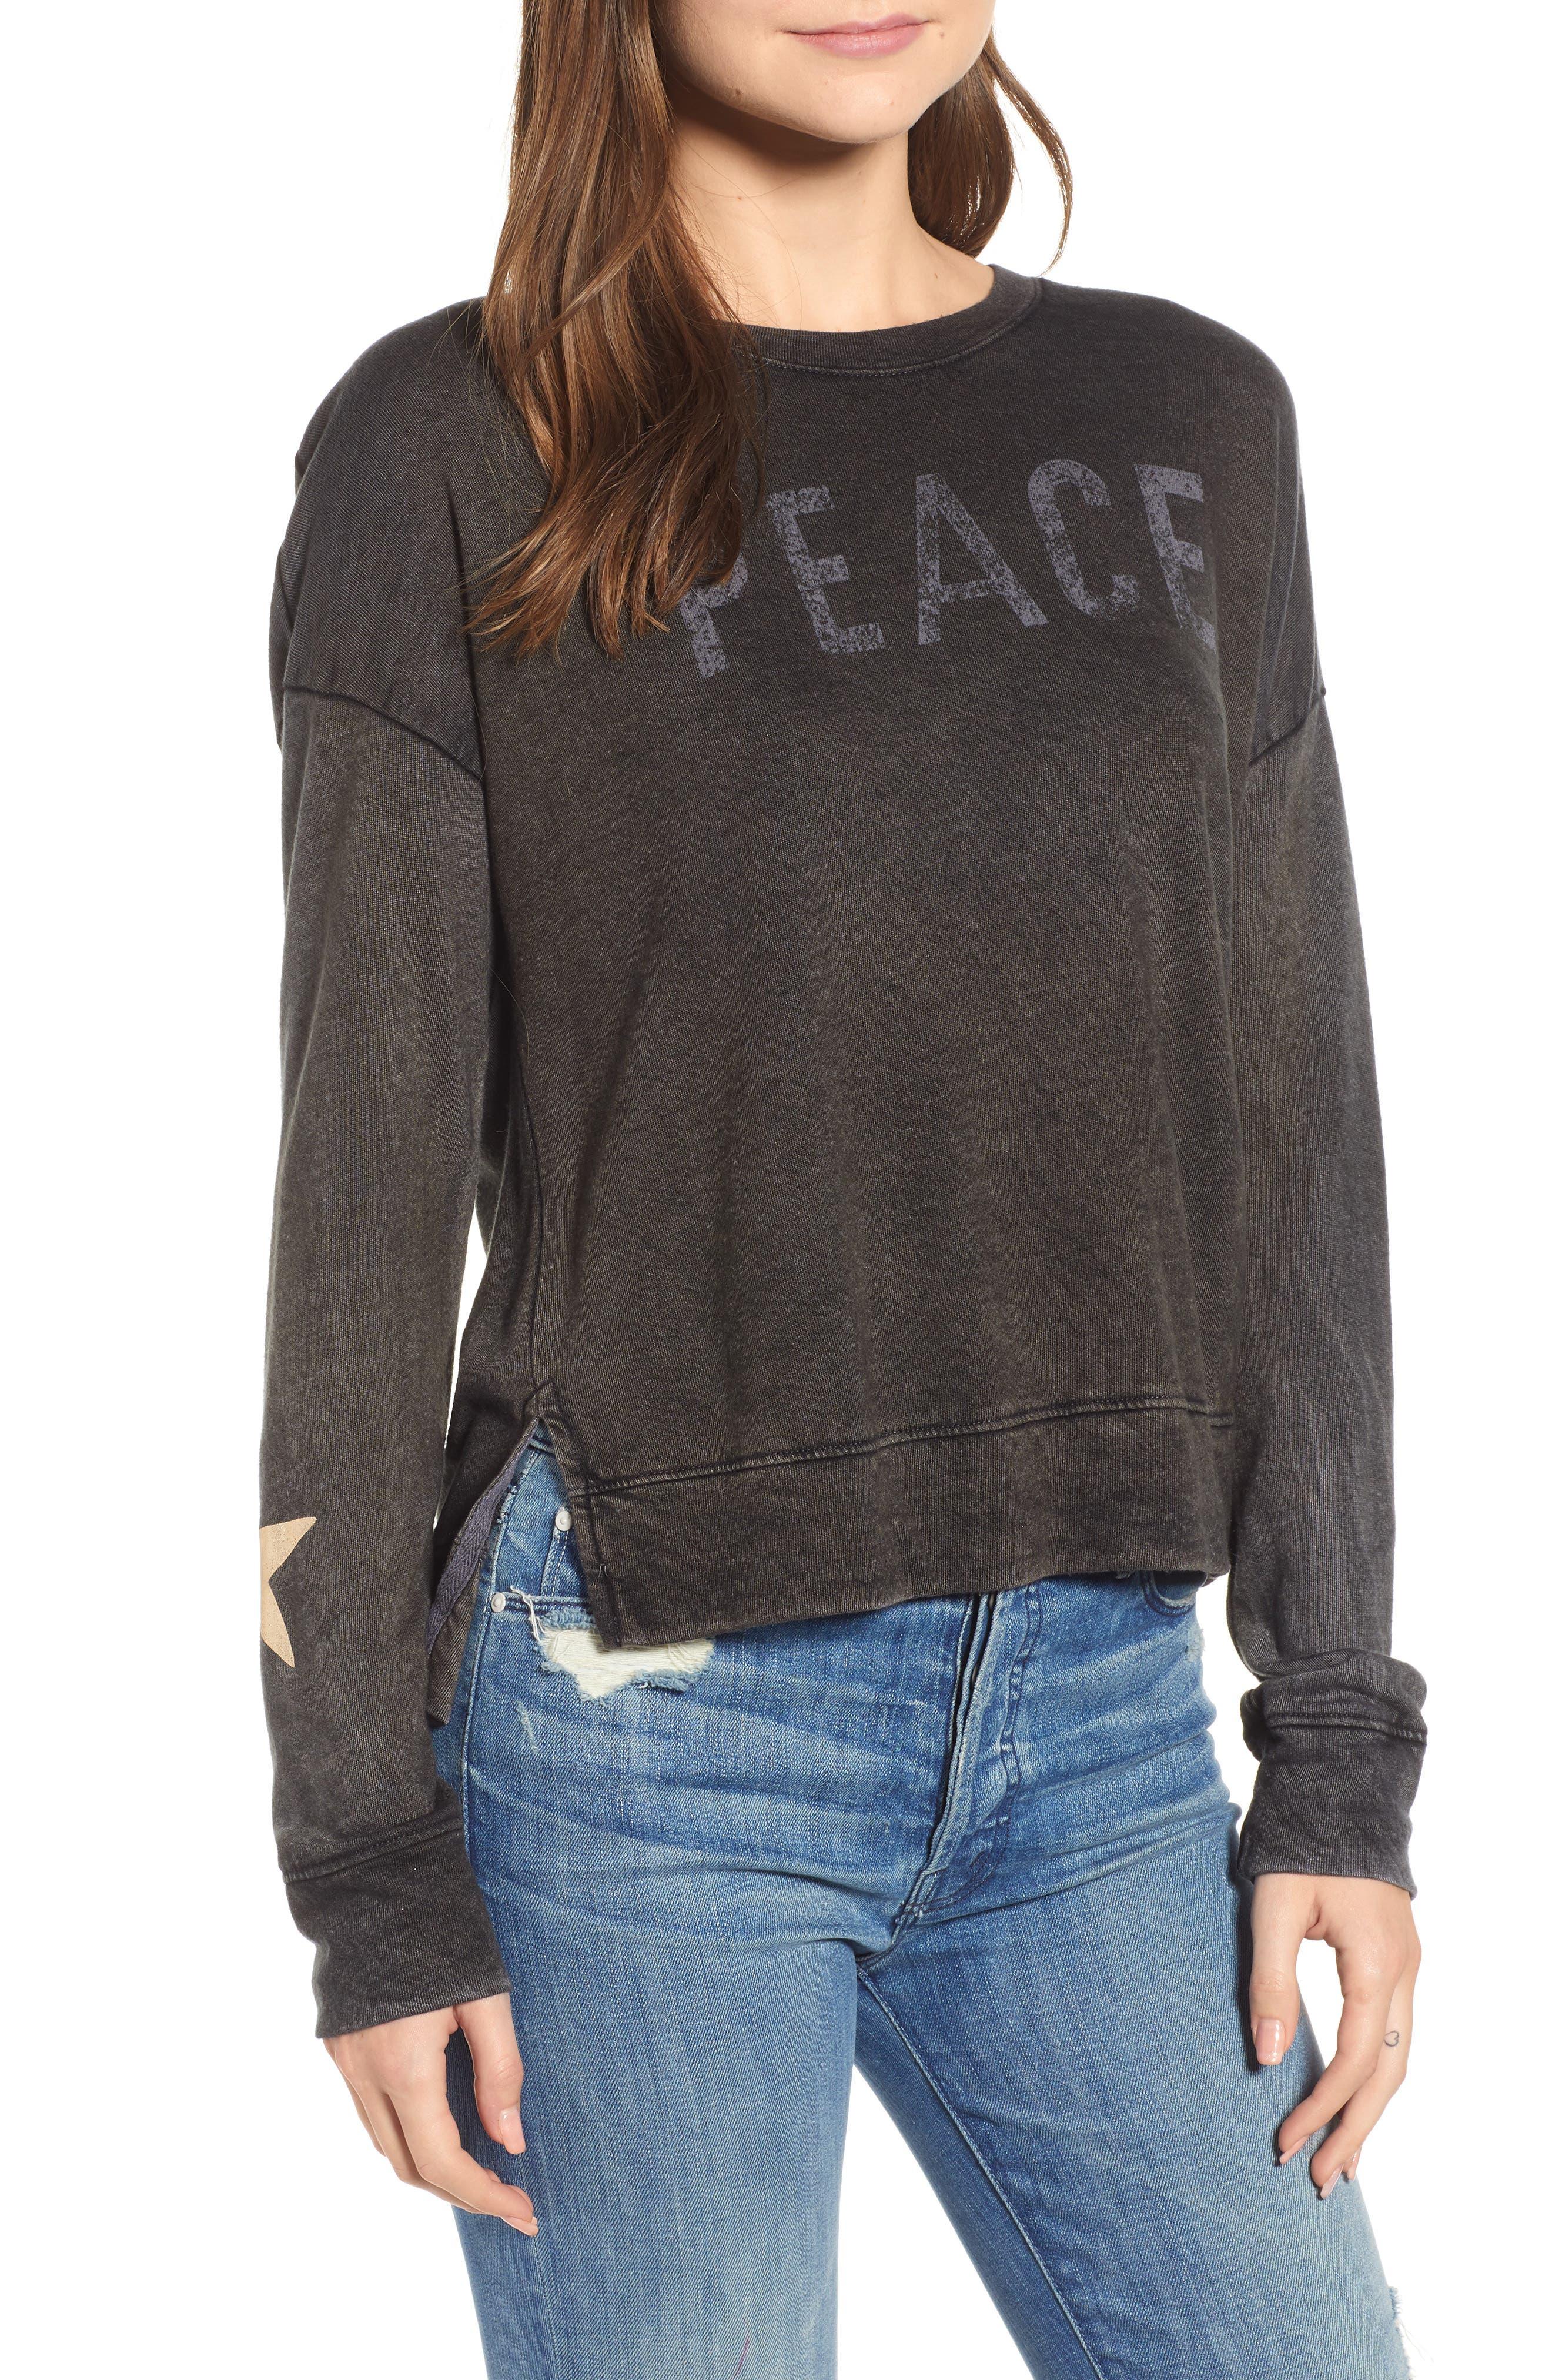 Peace Terry Sweatshirt,                         Main,                         color, VINTAGE BLACK